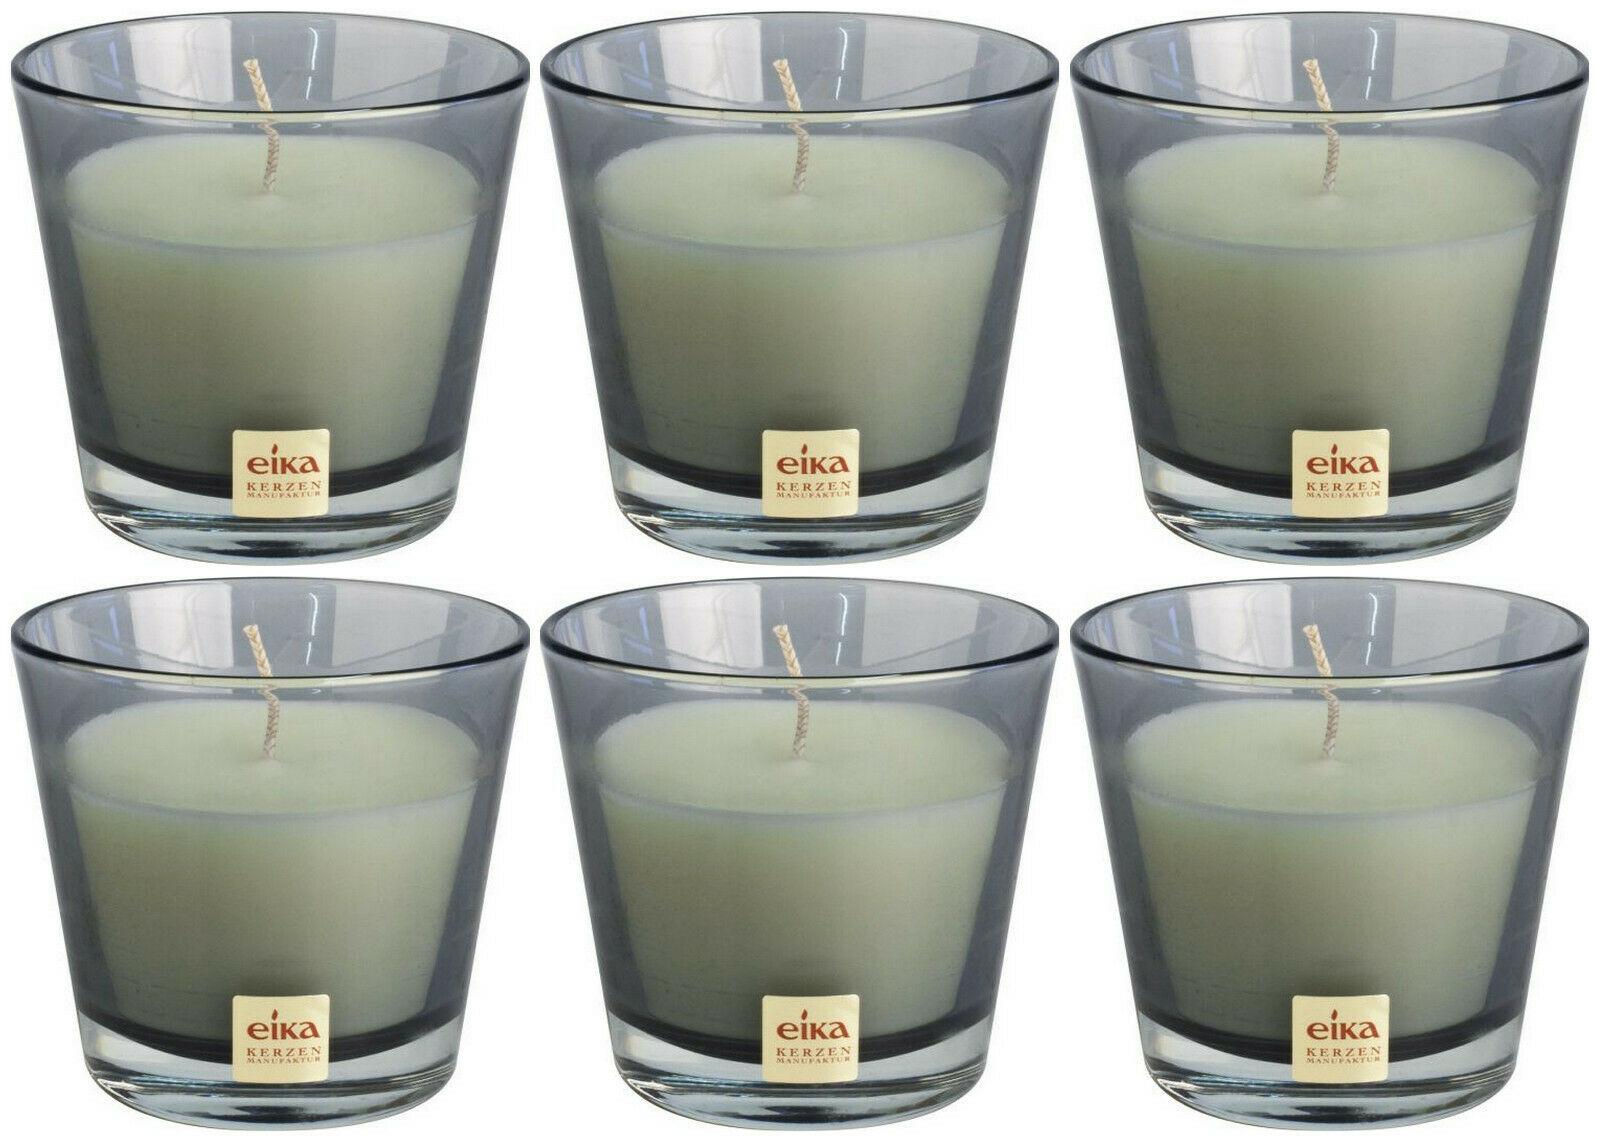 6 Stück Eika Kerzenglas 90x82 mm LARA Kerzen im Glas Candle Wachs Windlichtkerze - Steingrau